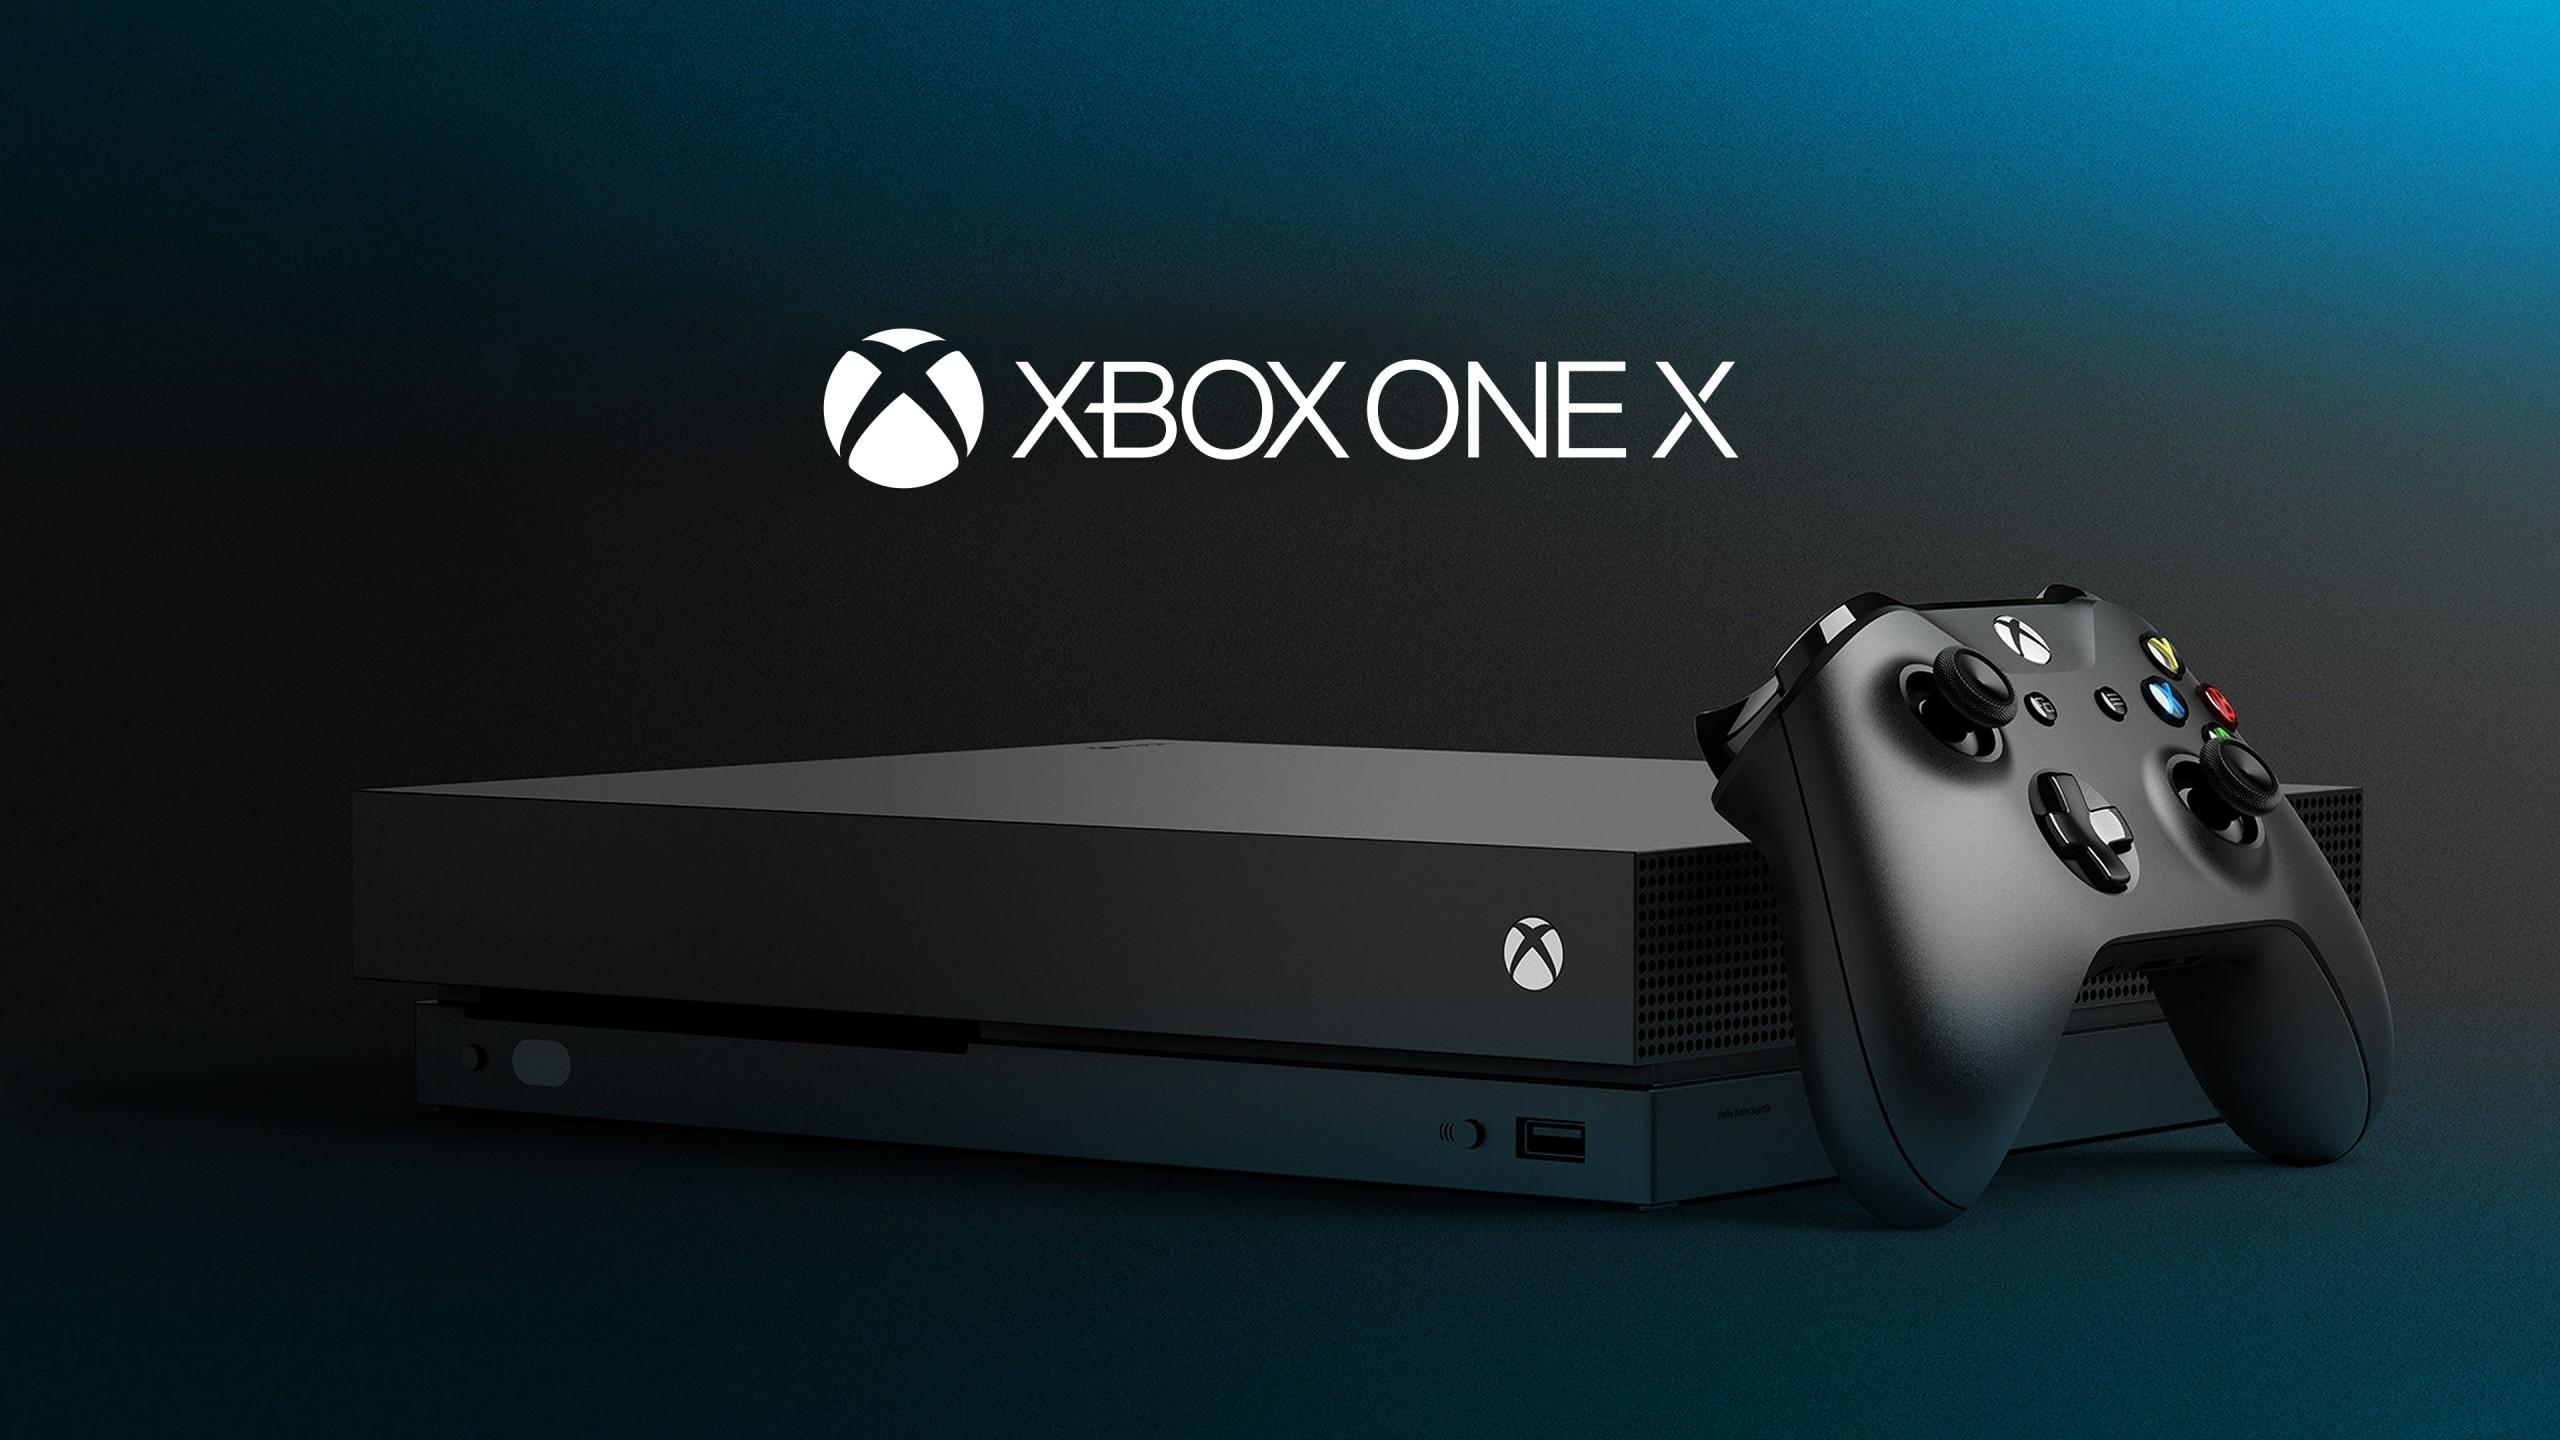 xbox-one-x-2560x1440-4k-gaming-console-microsoft-7887 : Free